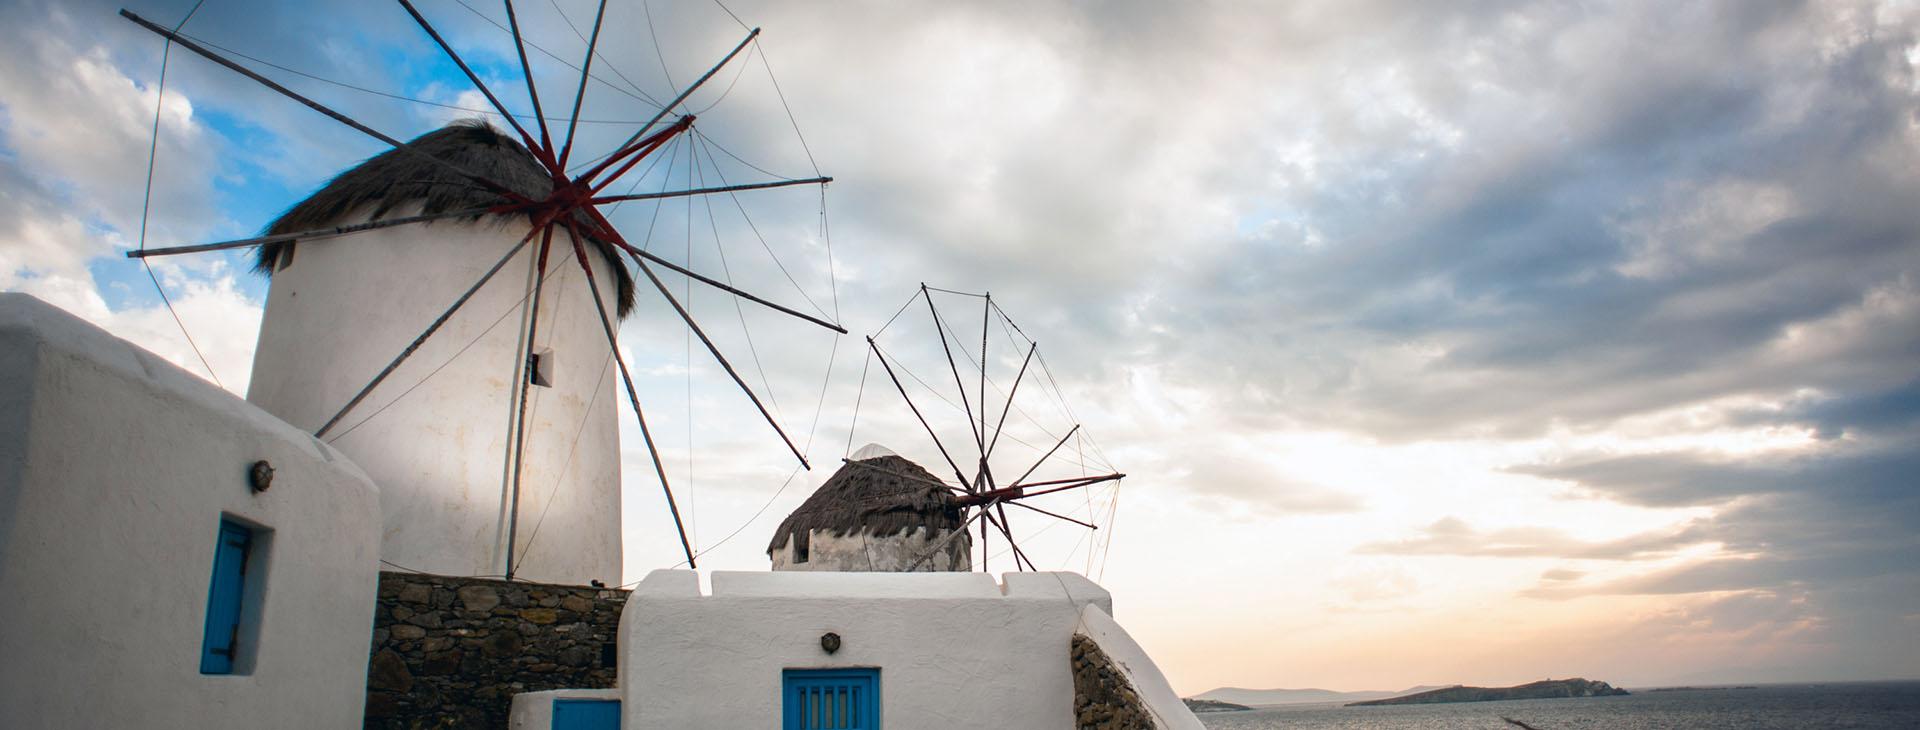 Windmills of Mykonos island